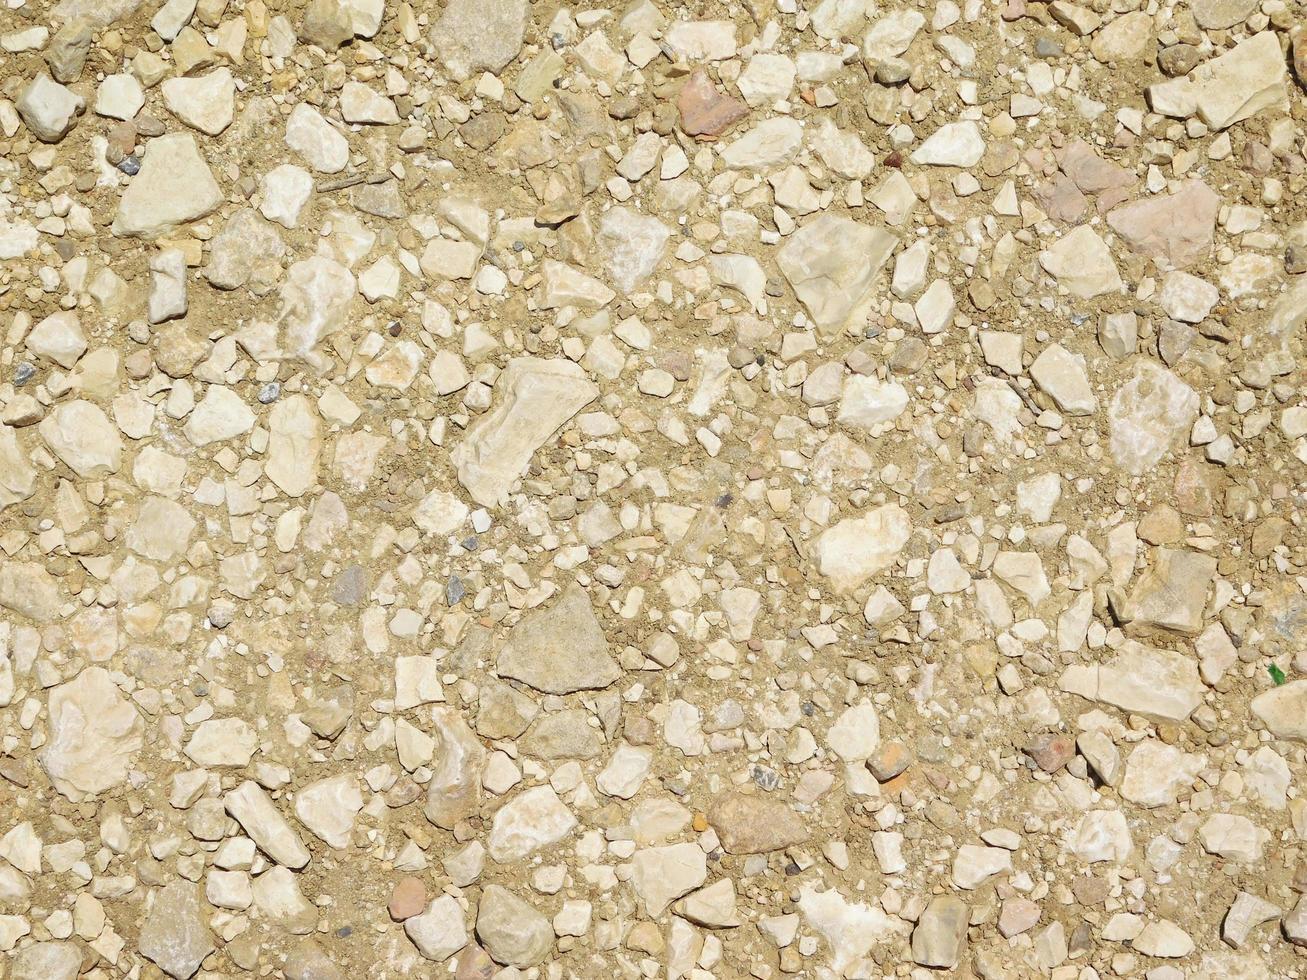 parche de tierra seca para fondo o textura foto